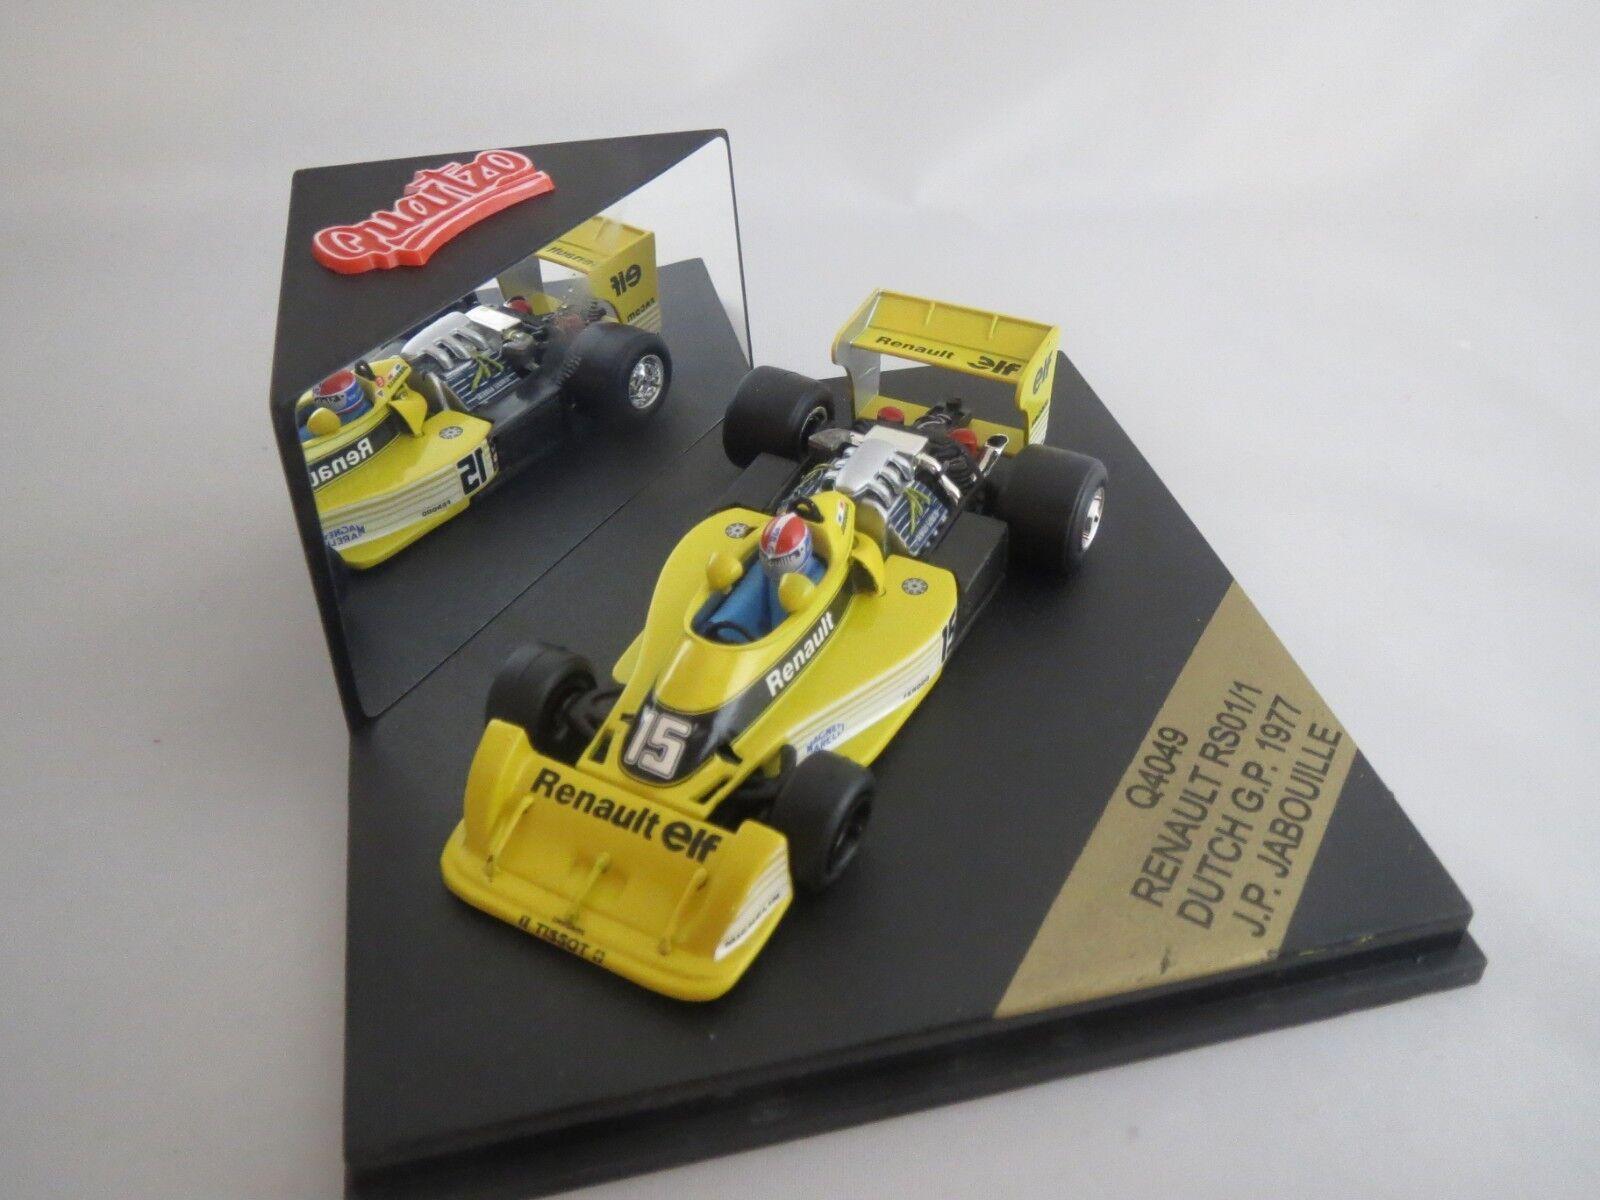 QUARTZO q4049 RENAULT rs01 1 (J.P. Jabouille) Dutch GP  15  1977  1 43